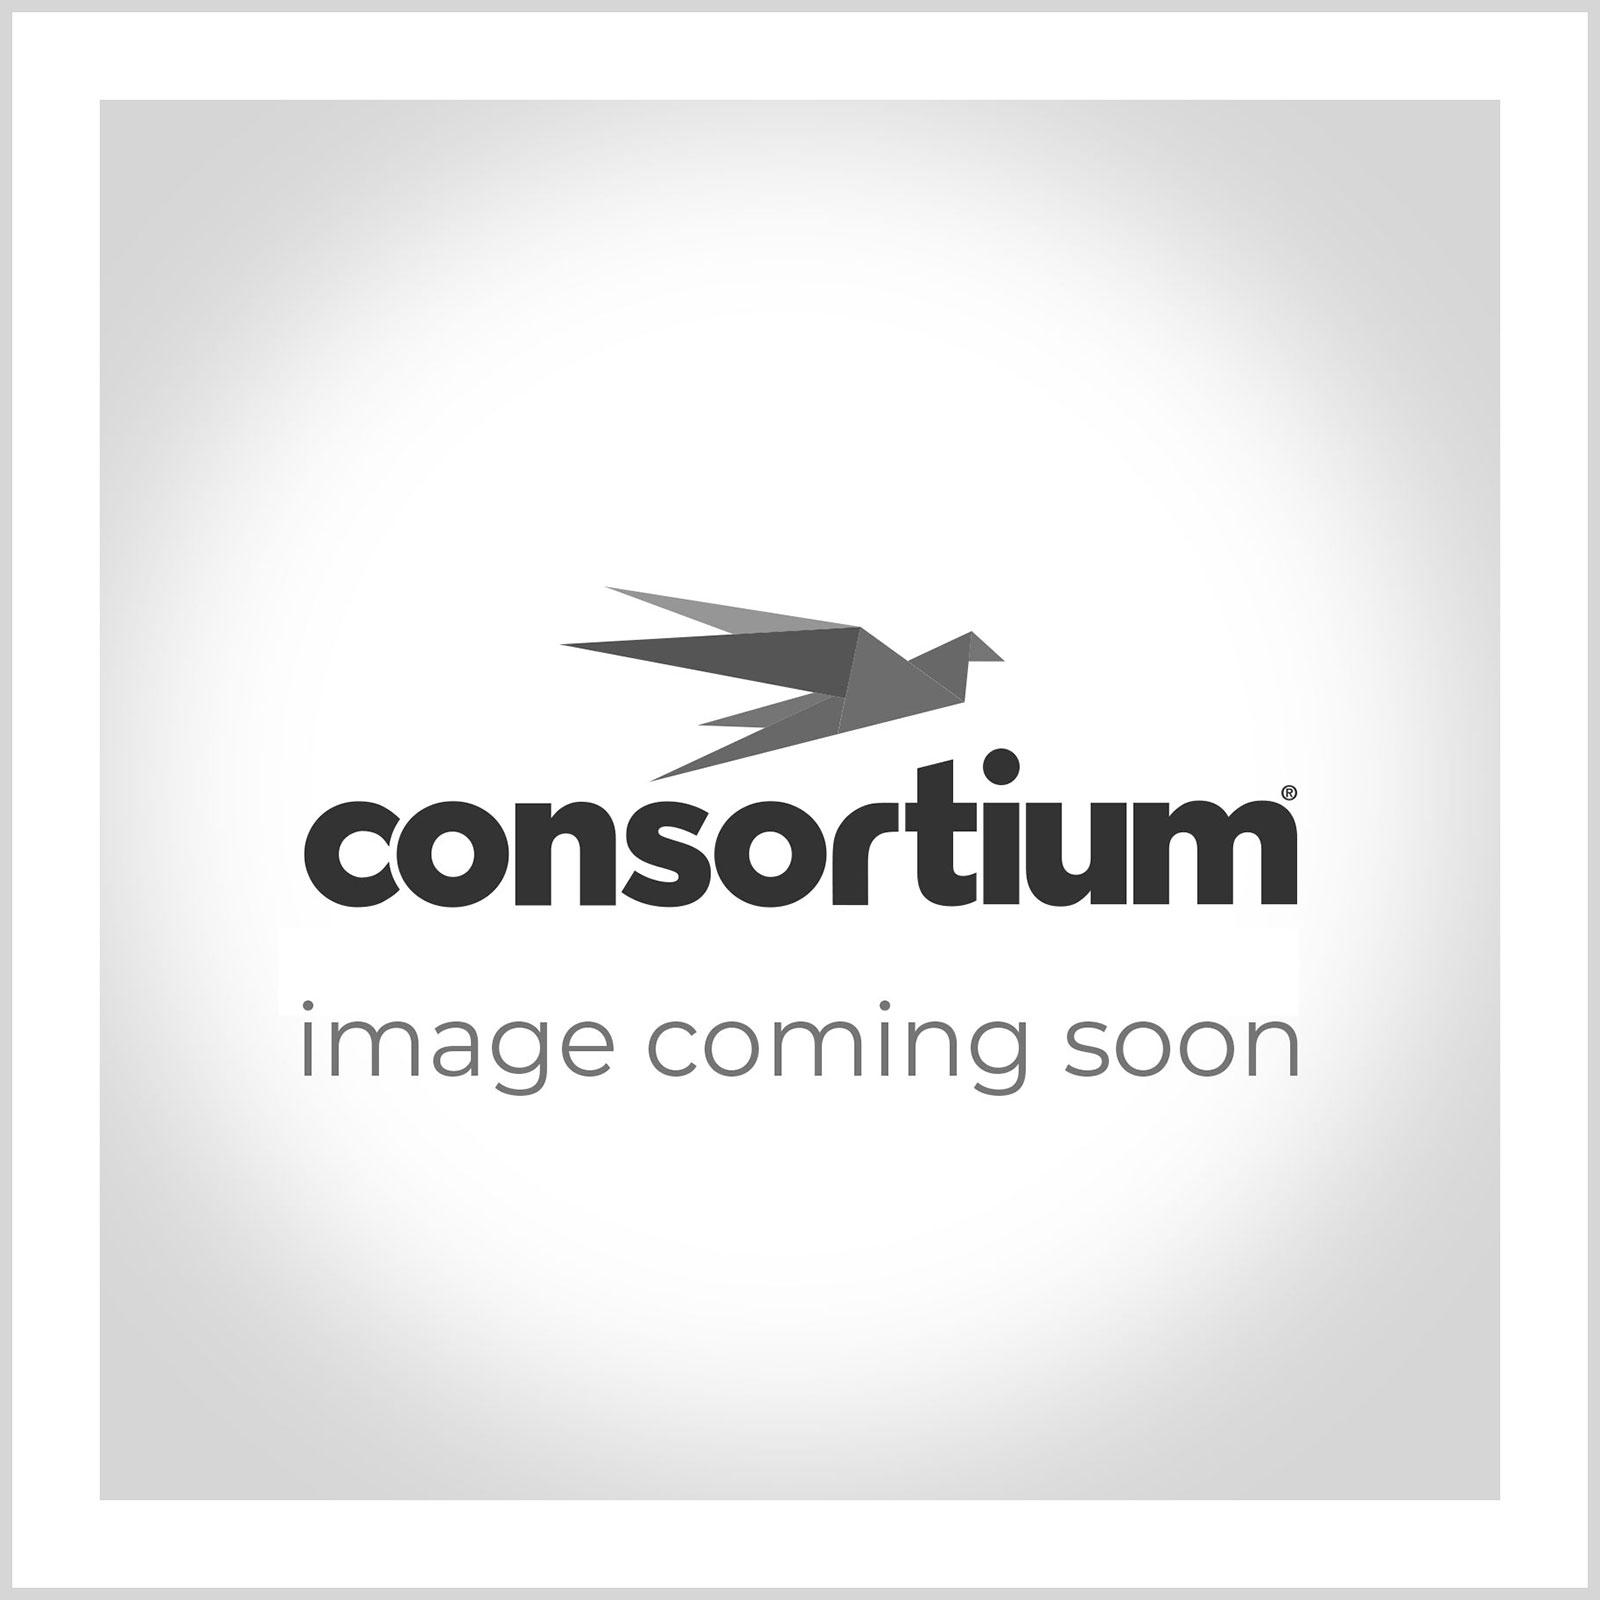 Consortium 2 Ply White Toilet Rolls